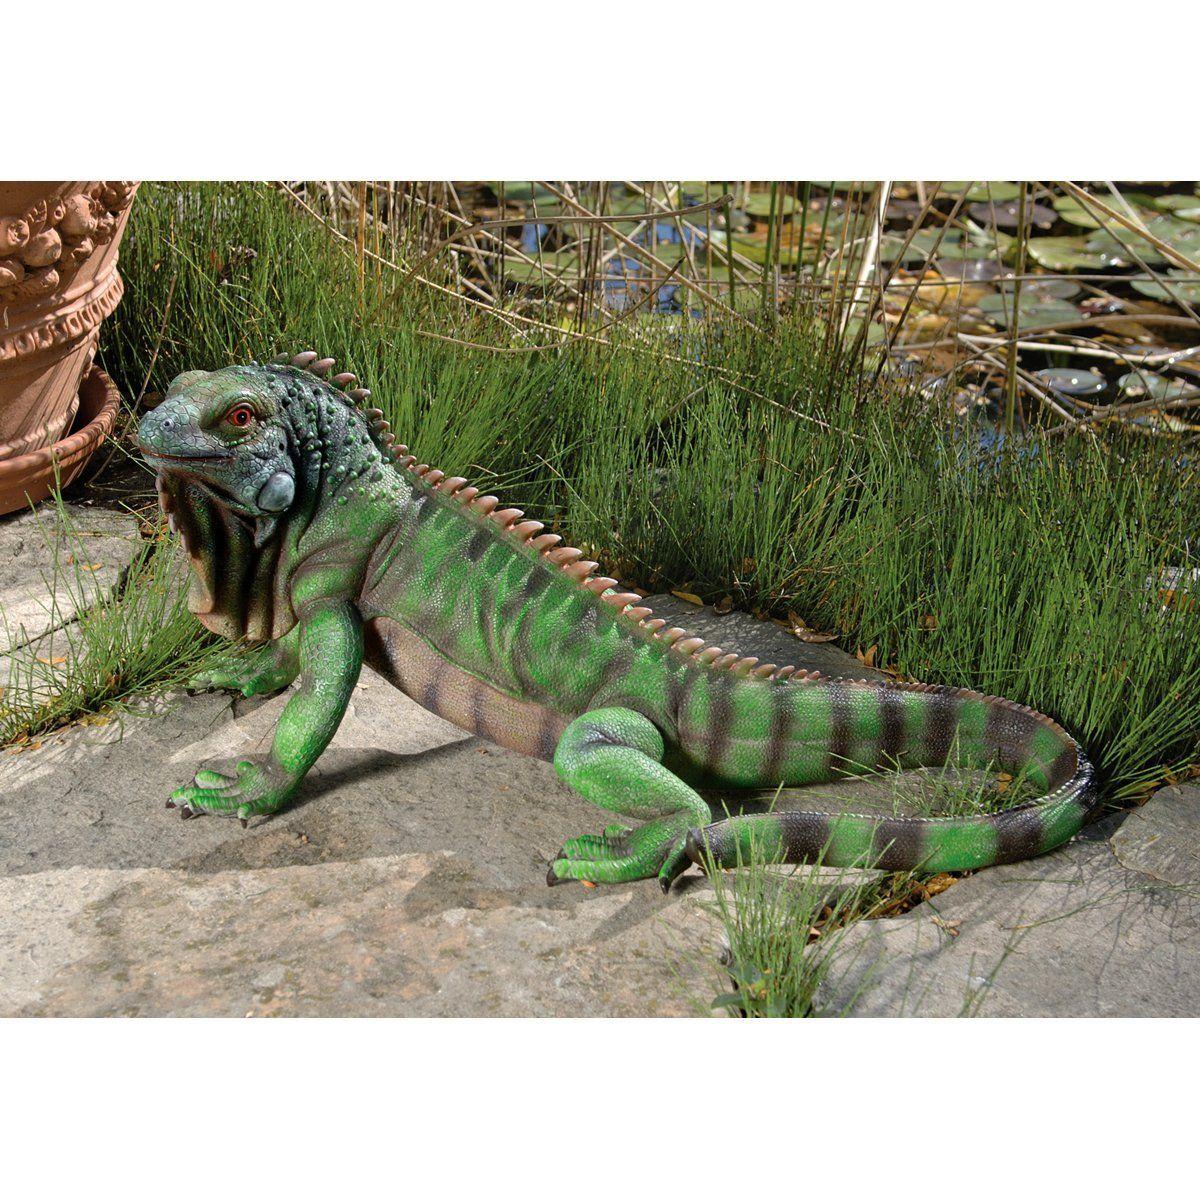 amazon com design toscano ne867207 giant iggy the iguana reptile